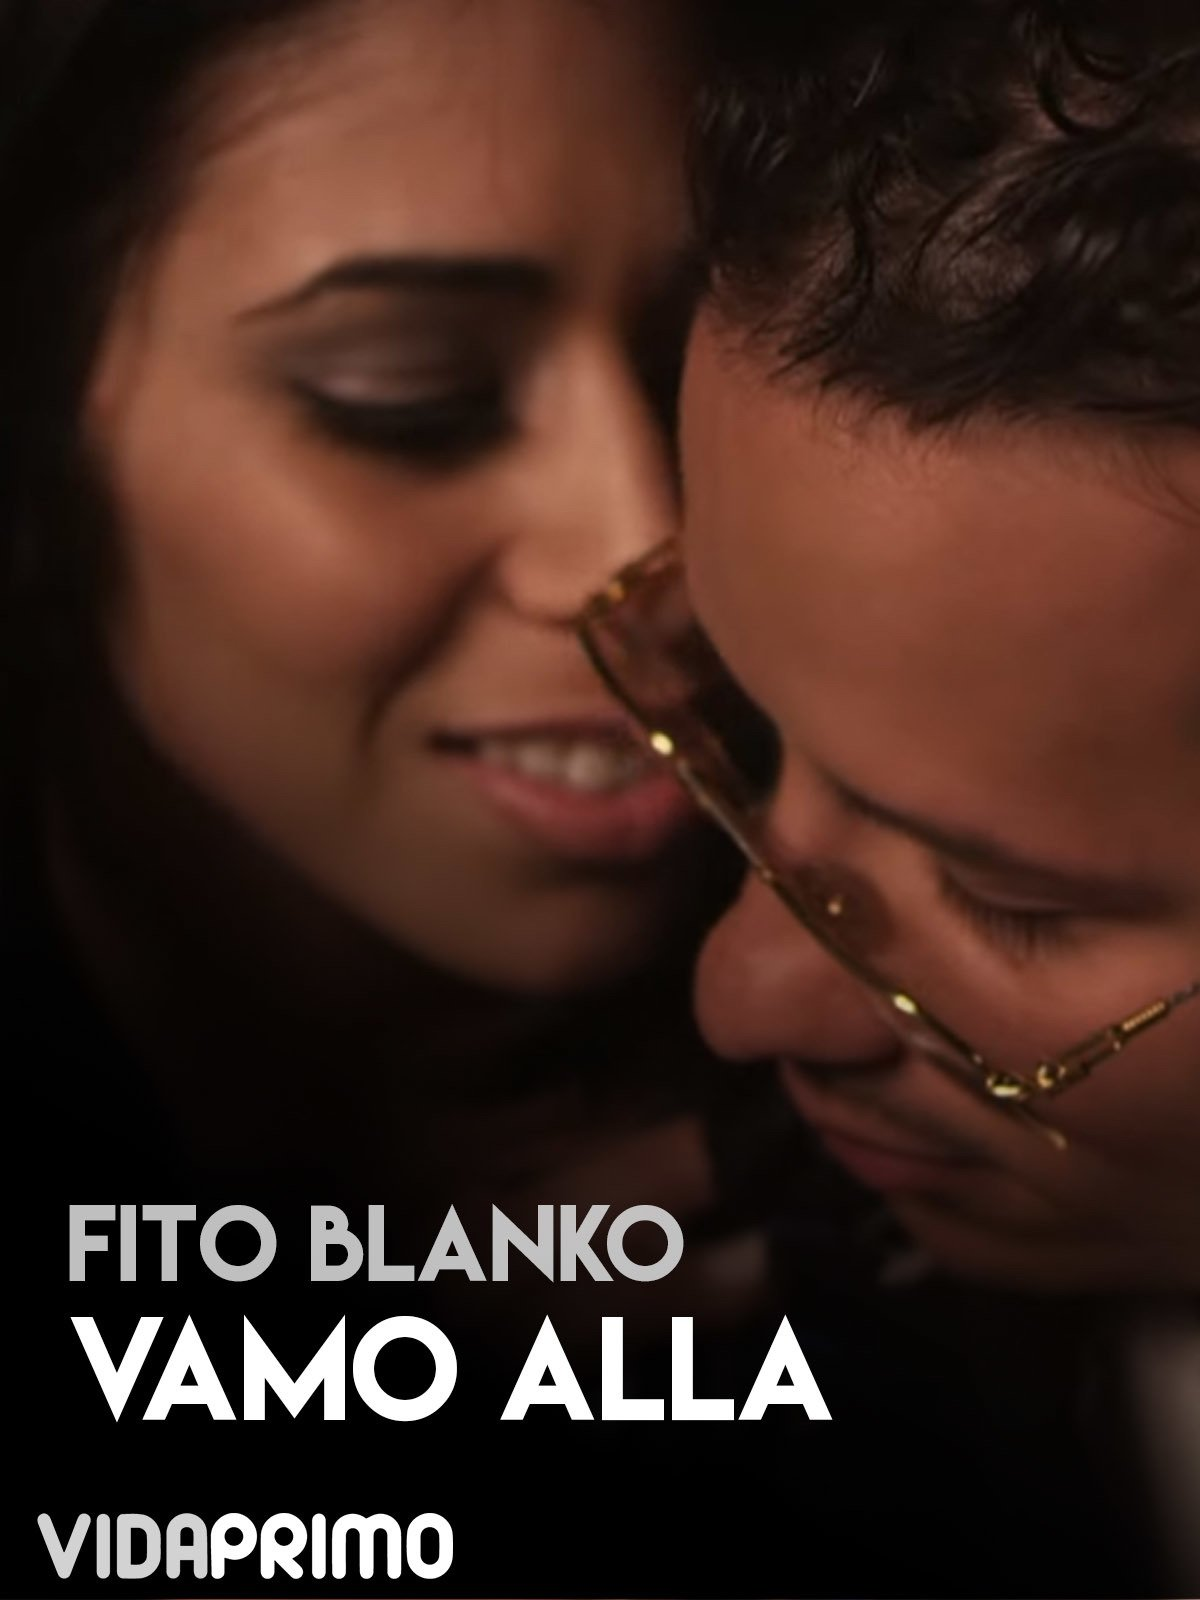 Fito Blanko